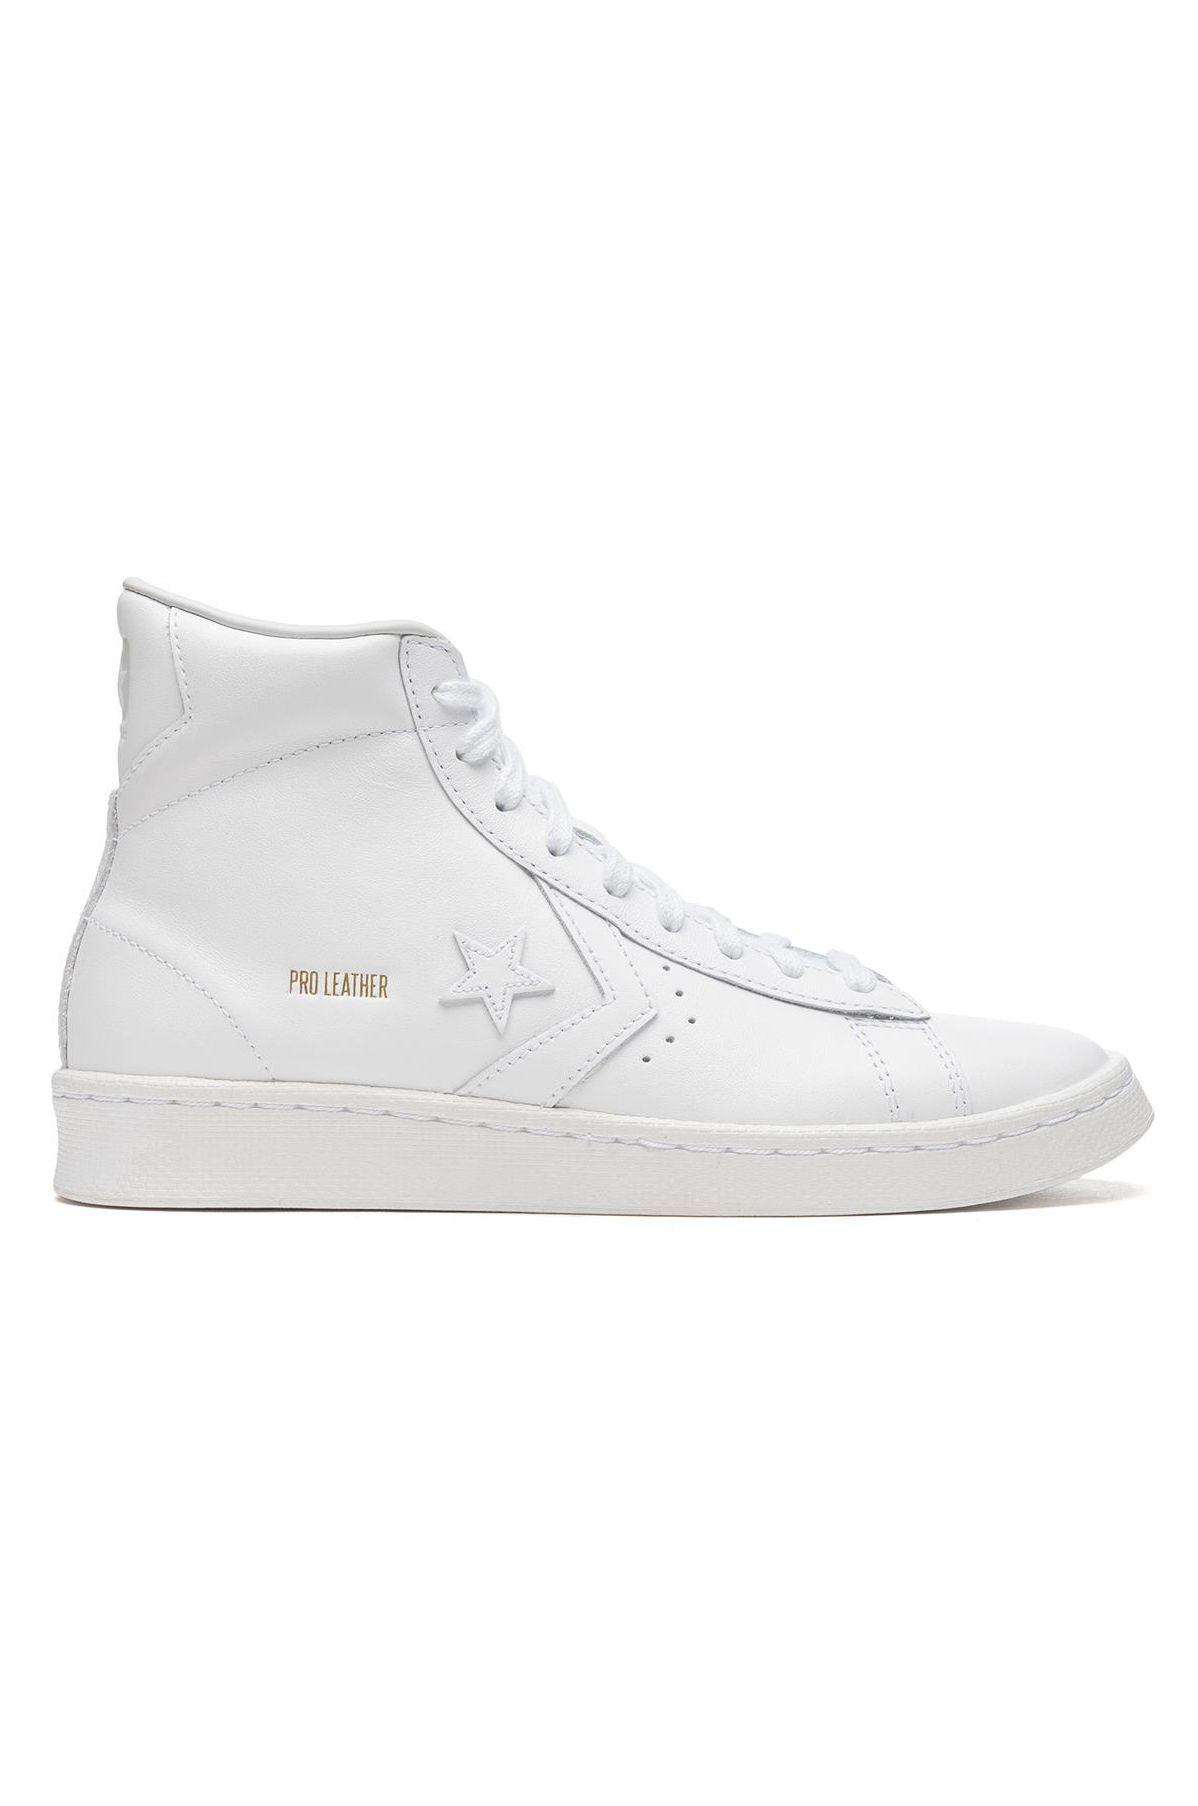 Converse Shoes PRO LEATHER HI White/White/White